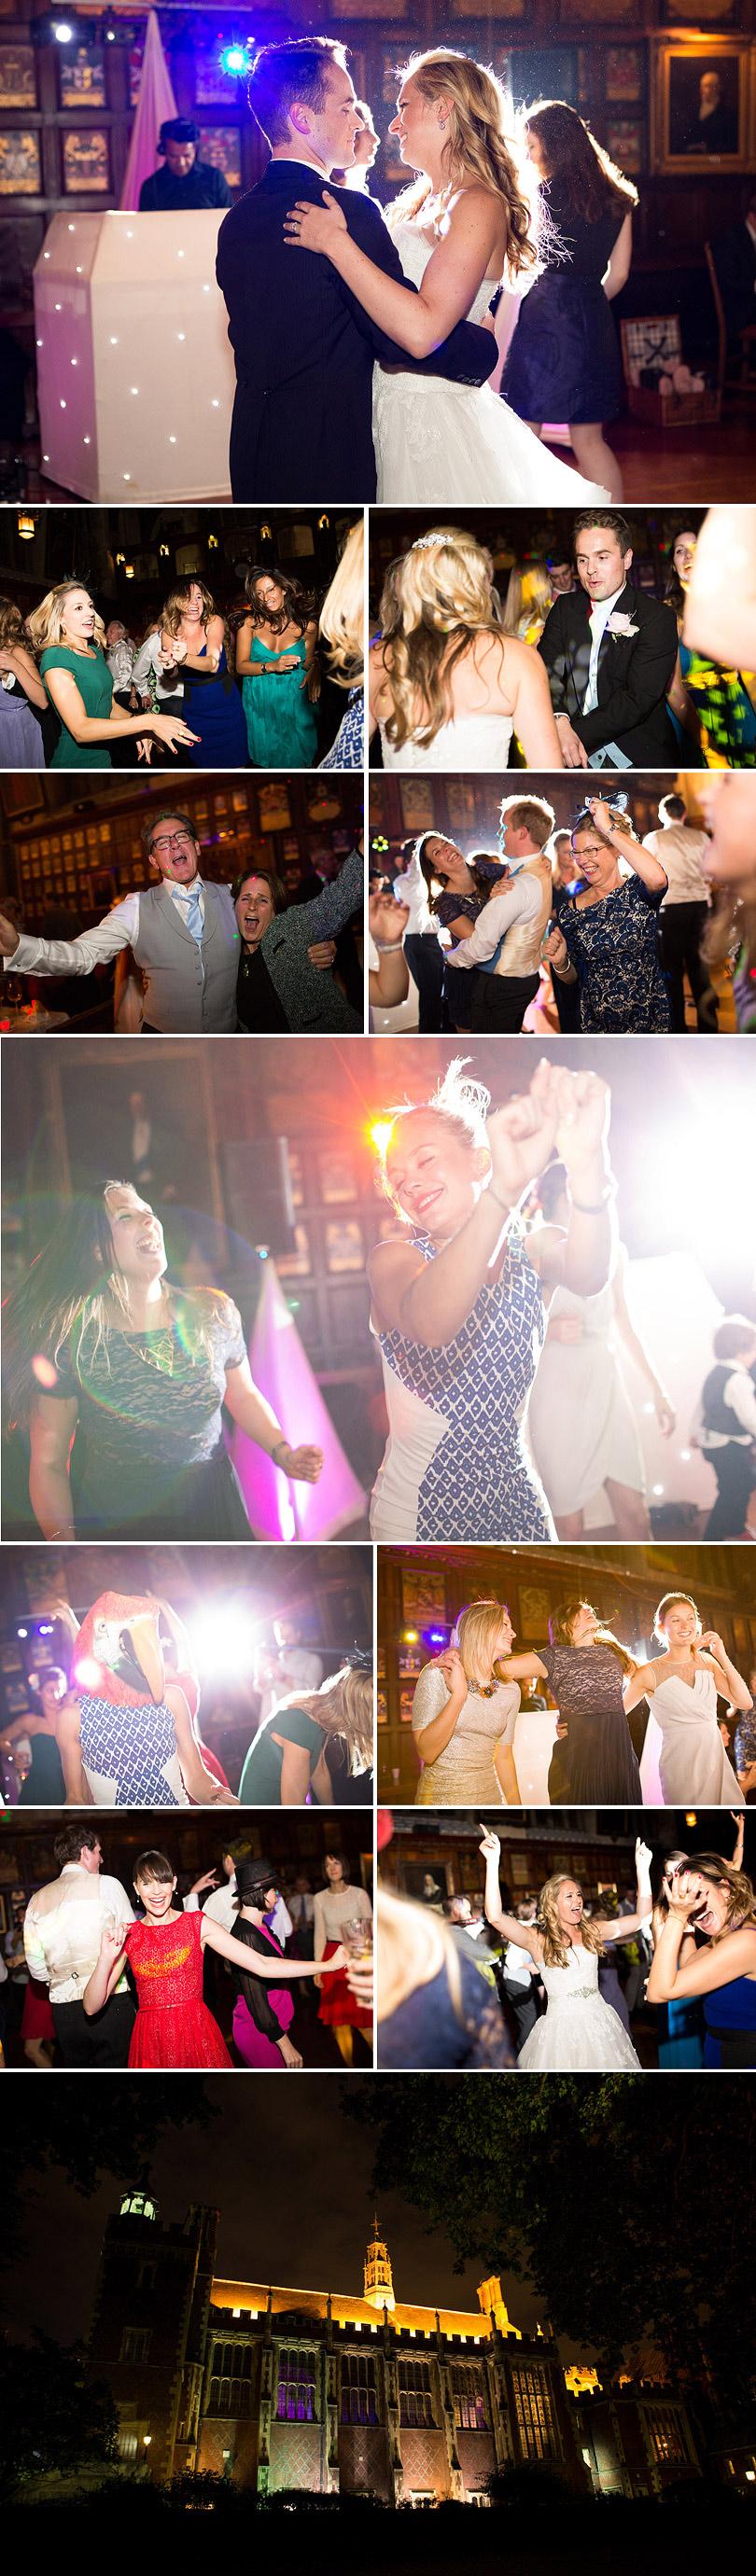 Brompton-Oratory-Lincolns-Inn-Wedding-RachelMax-027.jpg